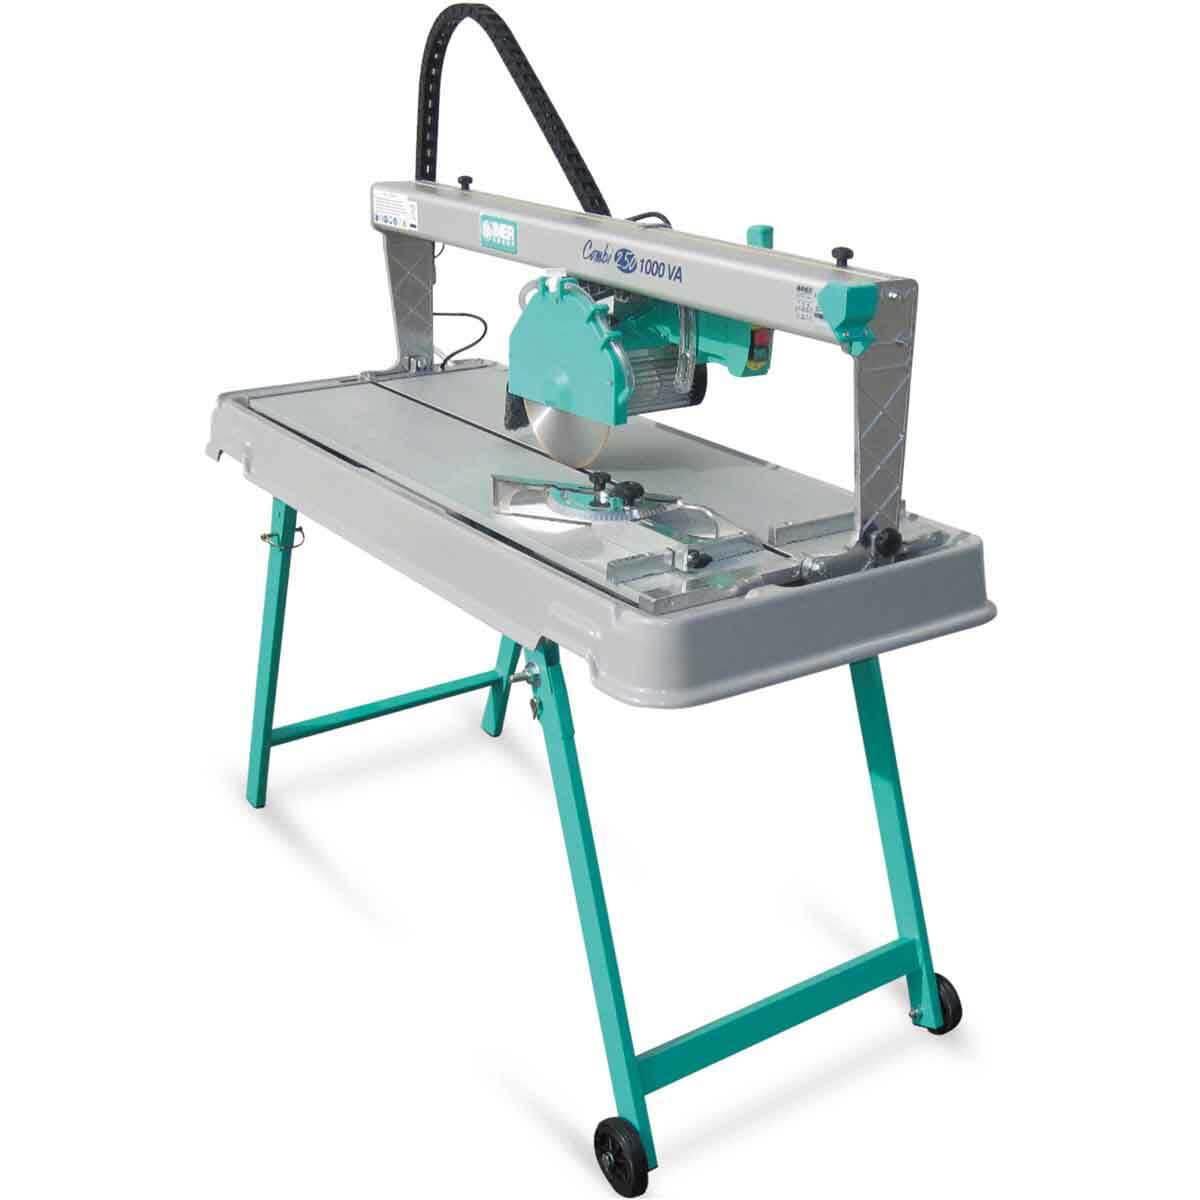 Imer Combi 250/1000VA Wet Saw  sc 1 st  Contractors Direct & Tile-Tools-Specials: Wet-Tent Brand: Imer Category: Adhesives ...